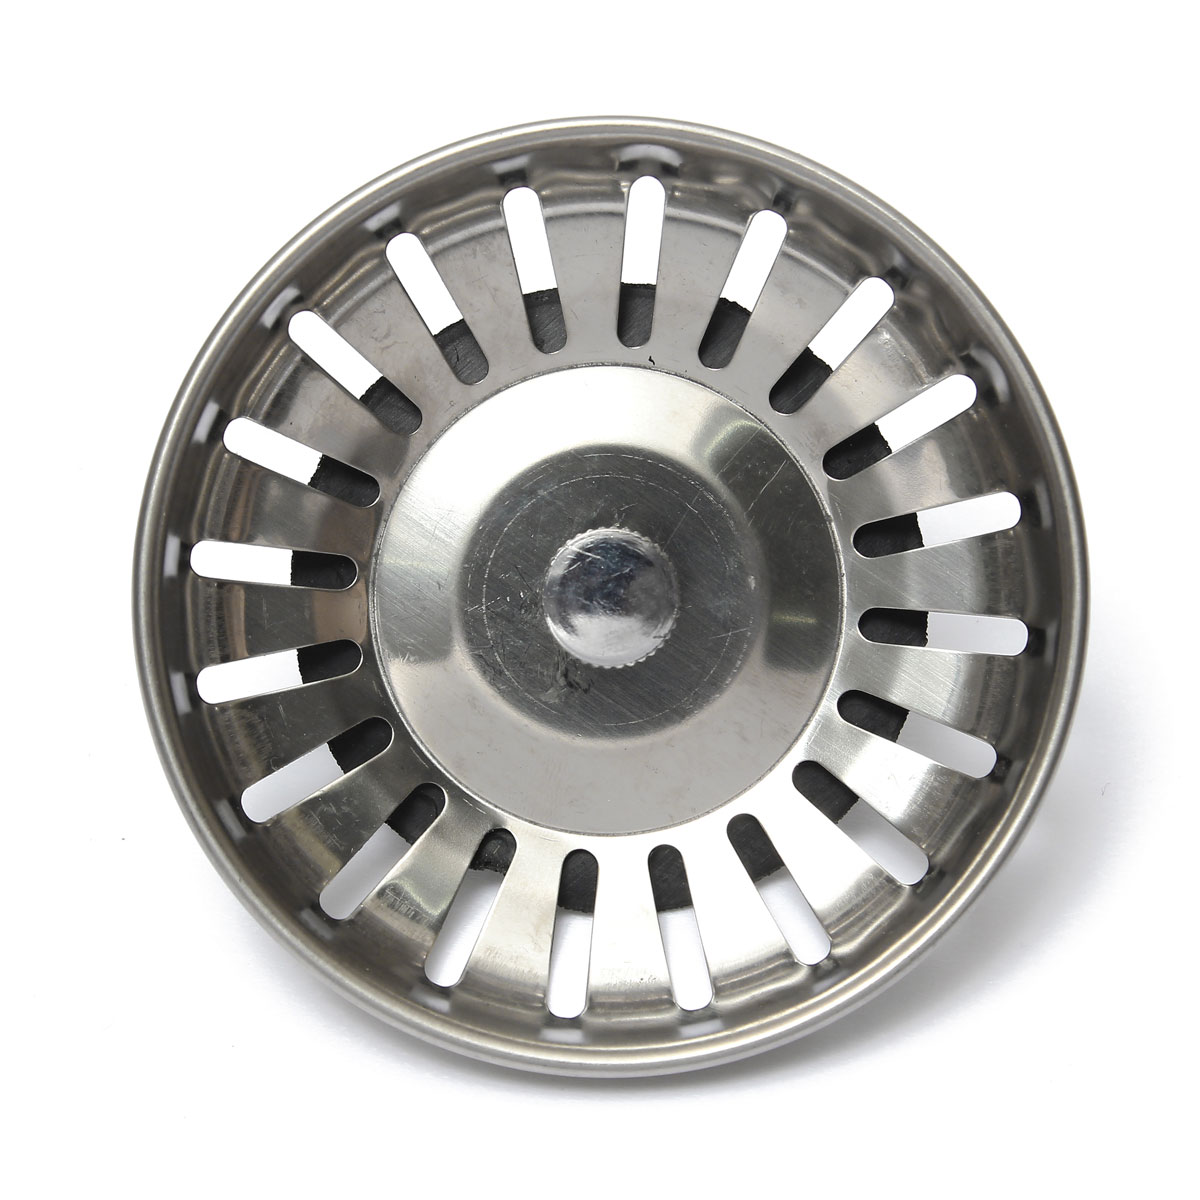 replacing kitchen sink drain basket replacing a kitchen sink Kitchen Sink Repair Drain Basket Best Ideas